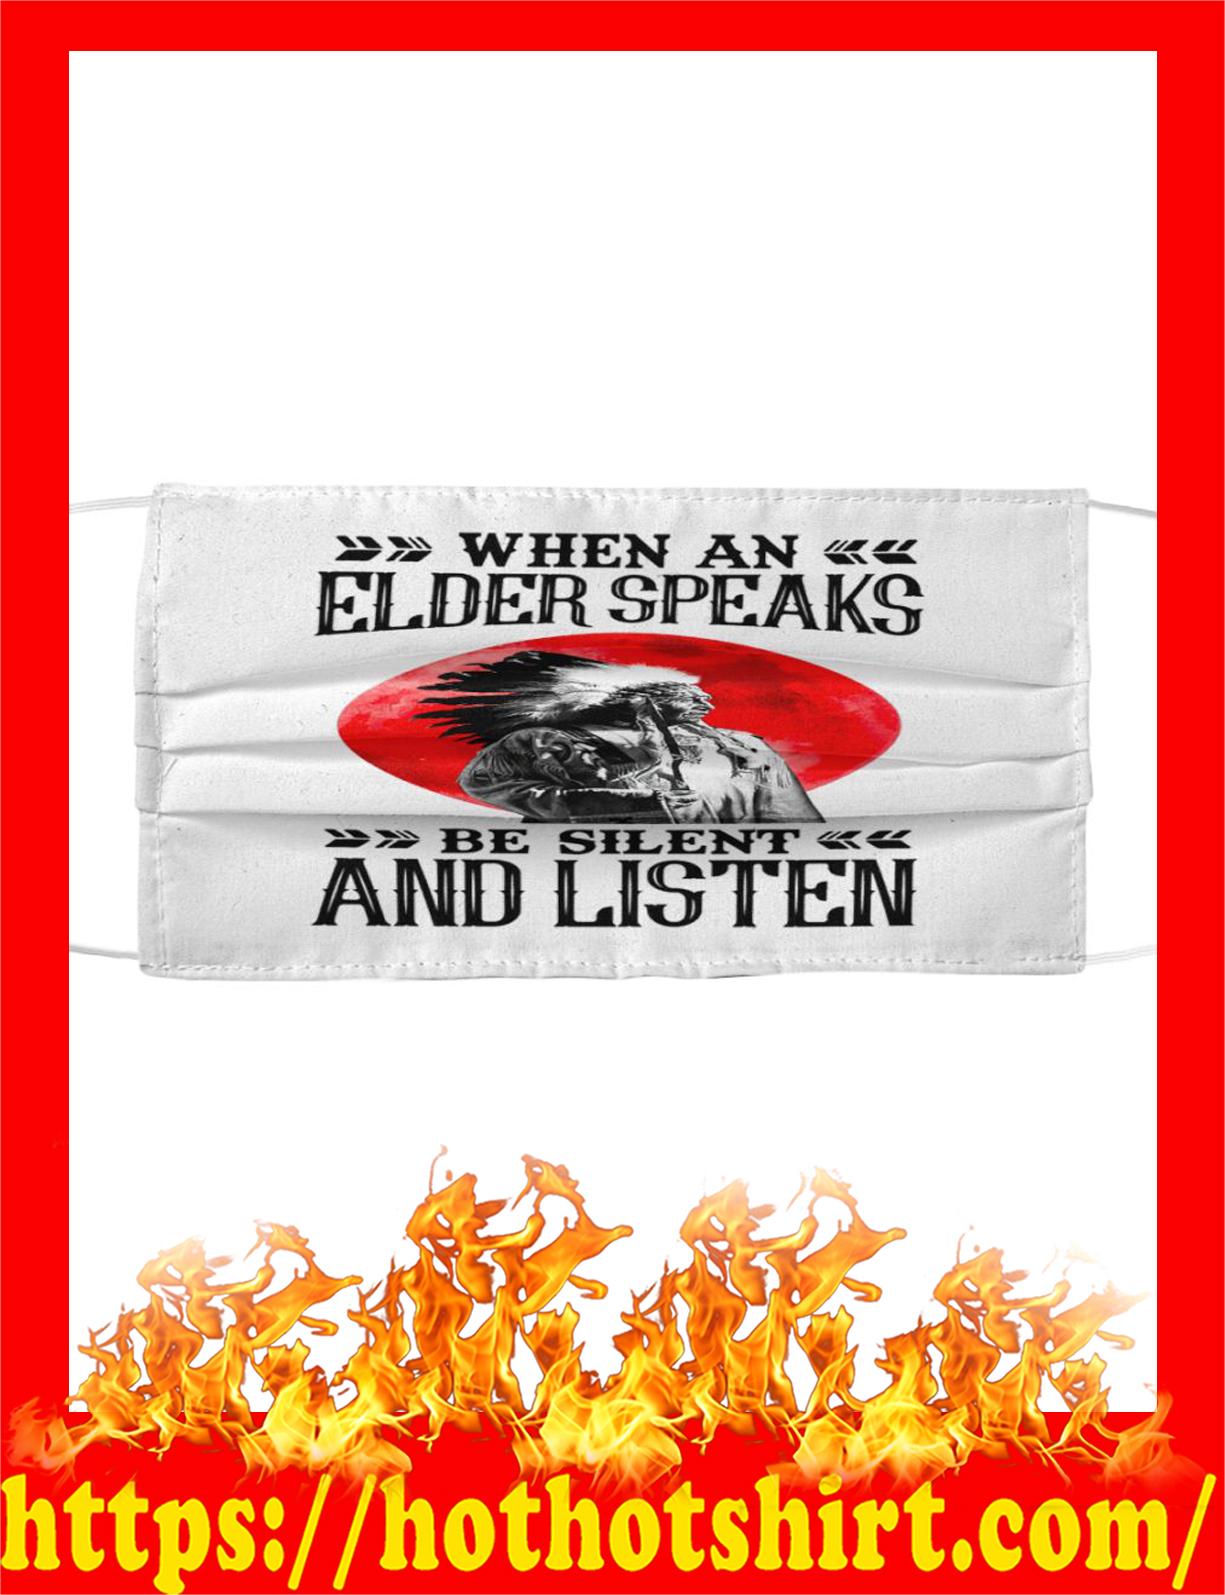 When an elder speaks be silent and listen cloth mask - detail